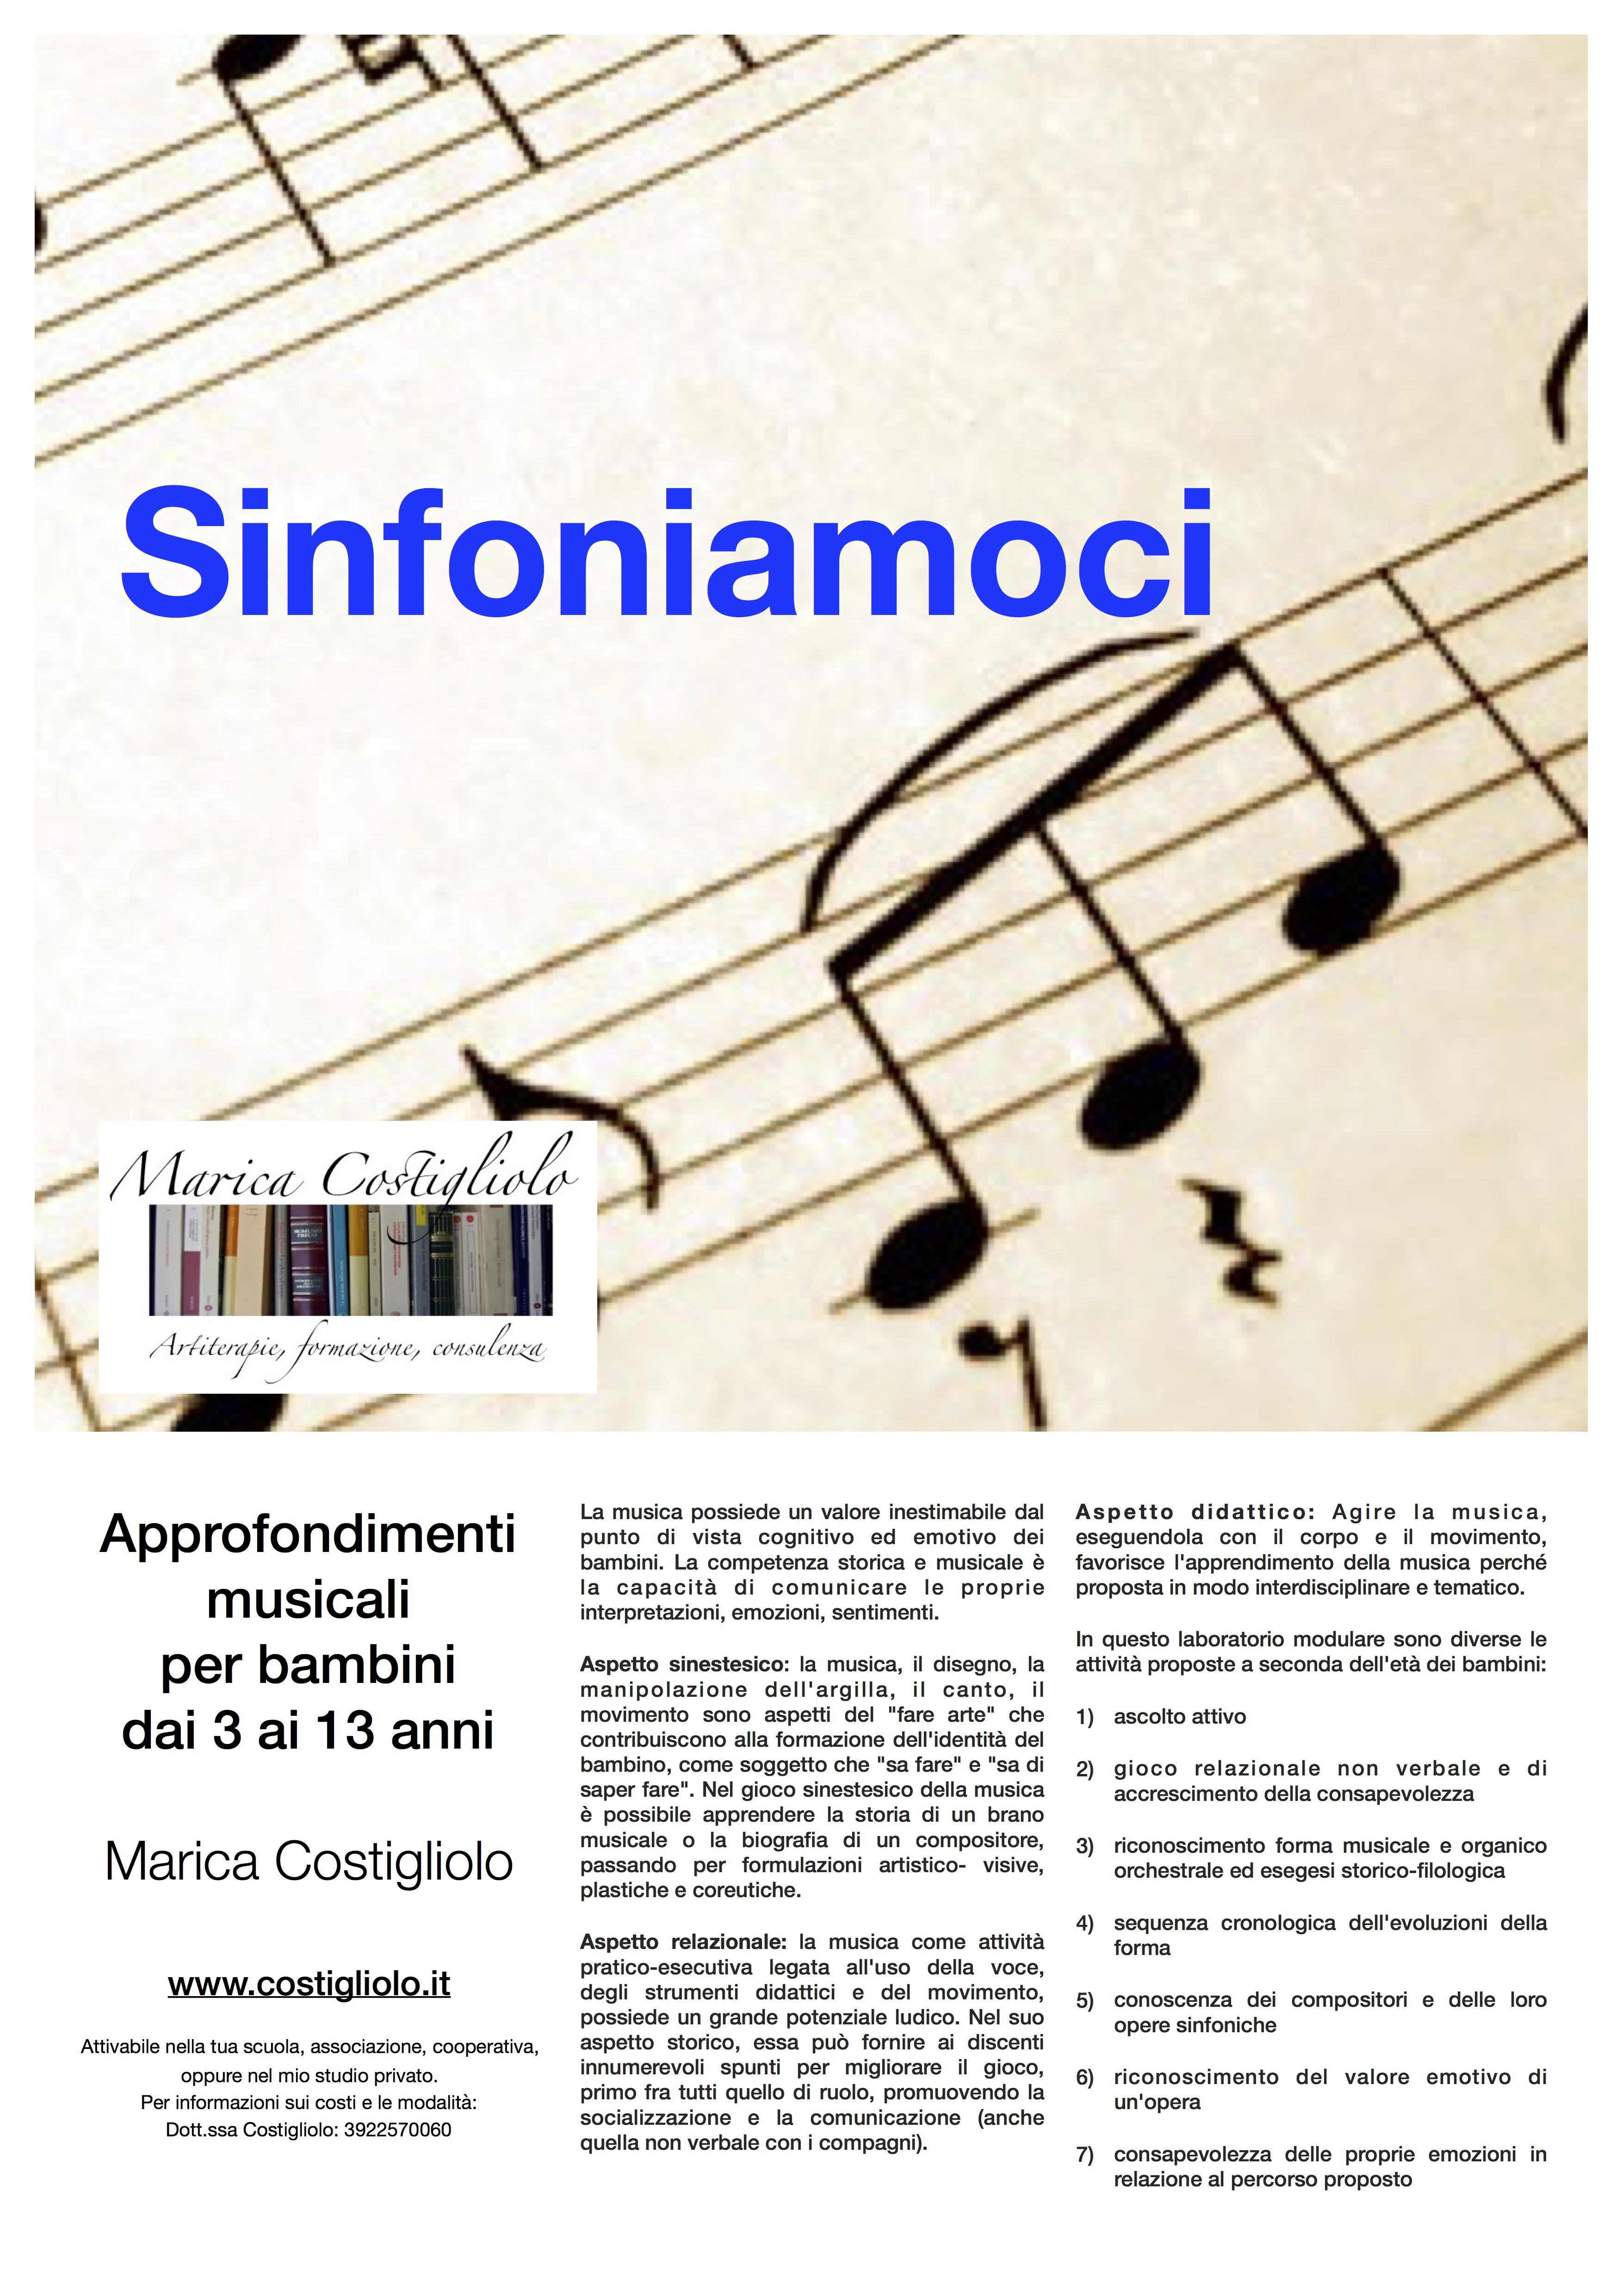 Sinfoniamoci